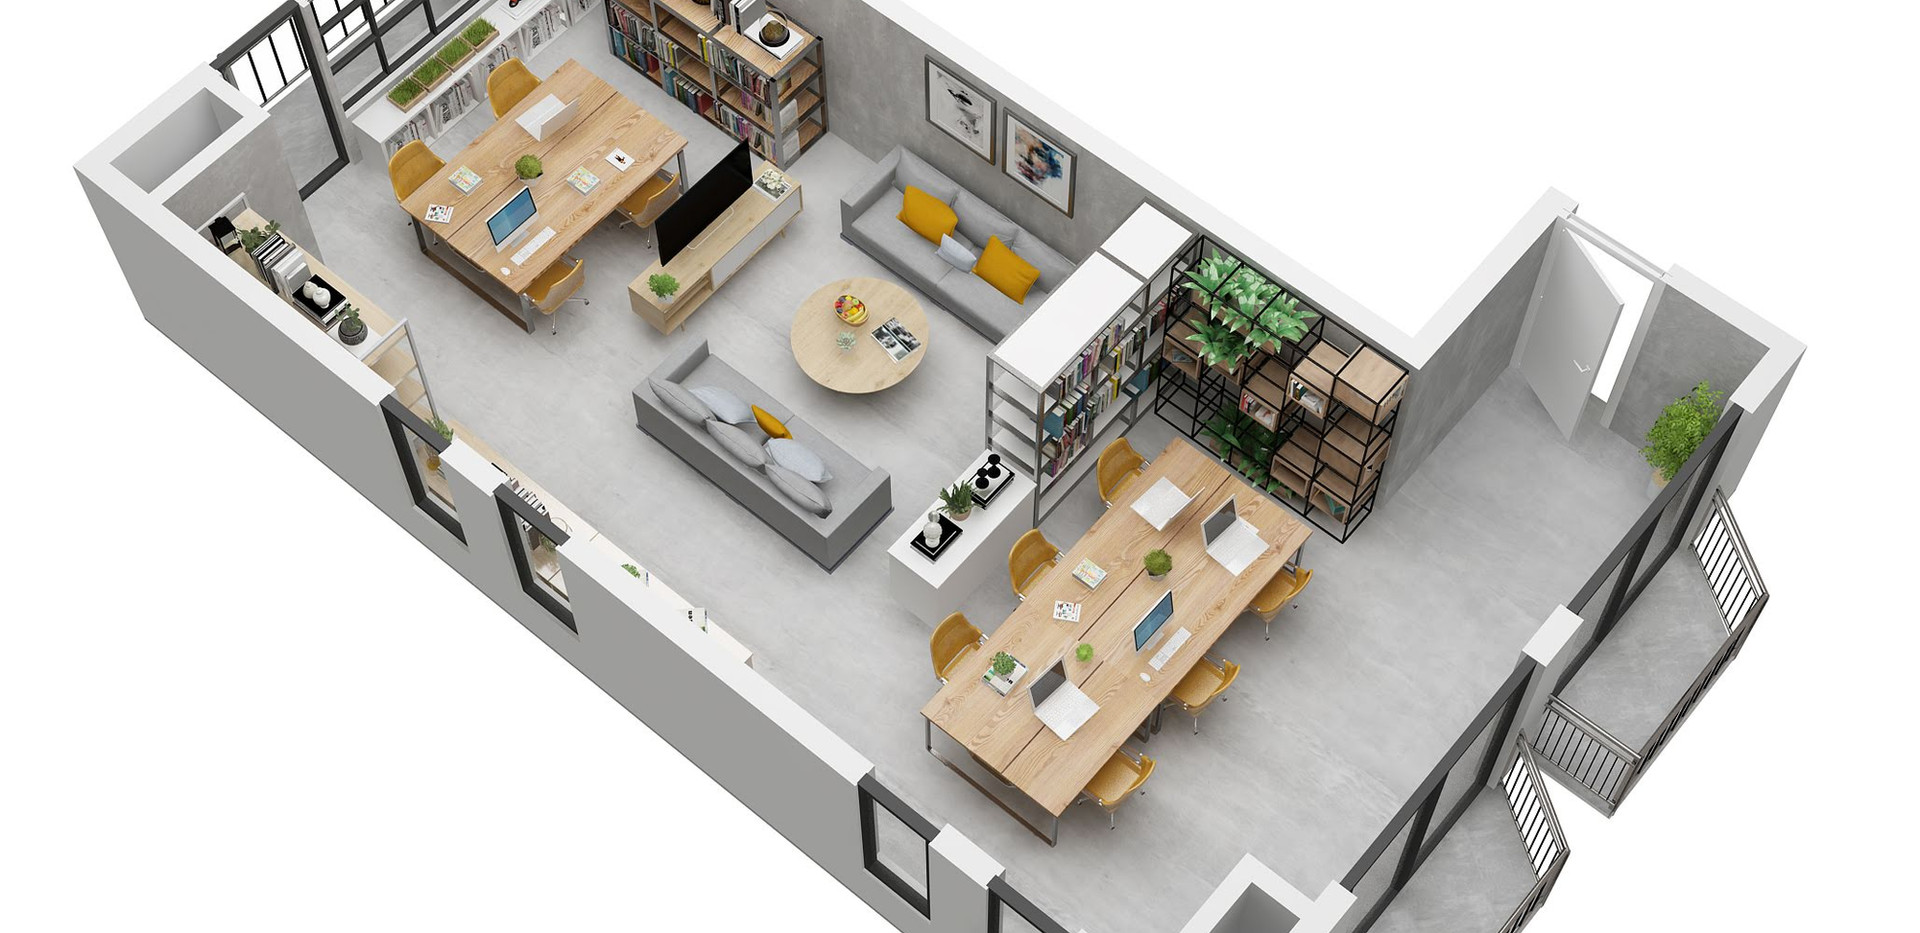 rubyykleung_perpective_3D Floorplan office